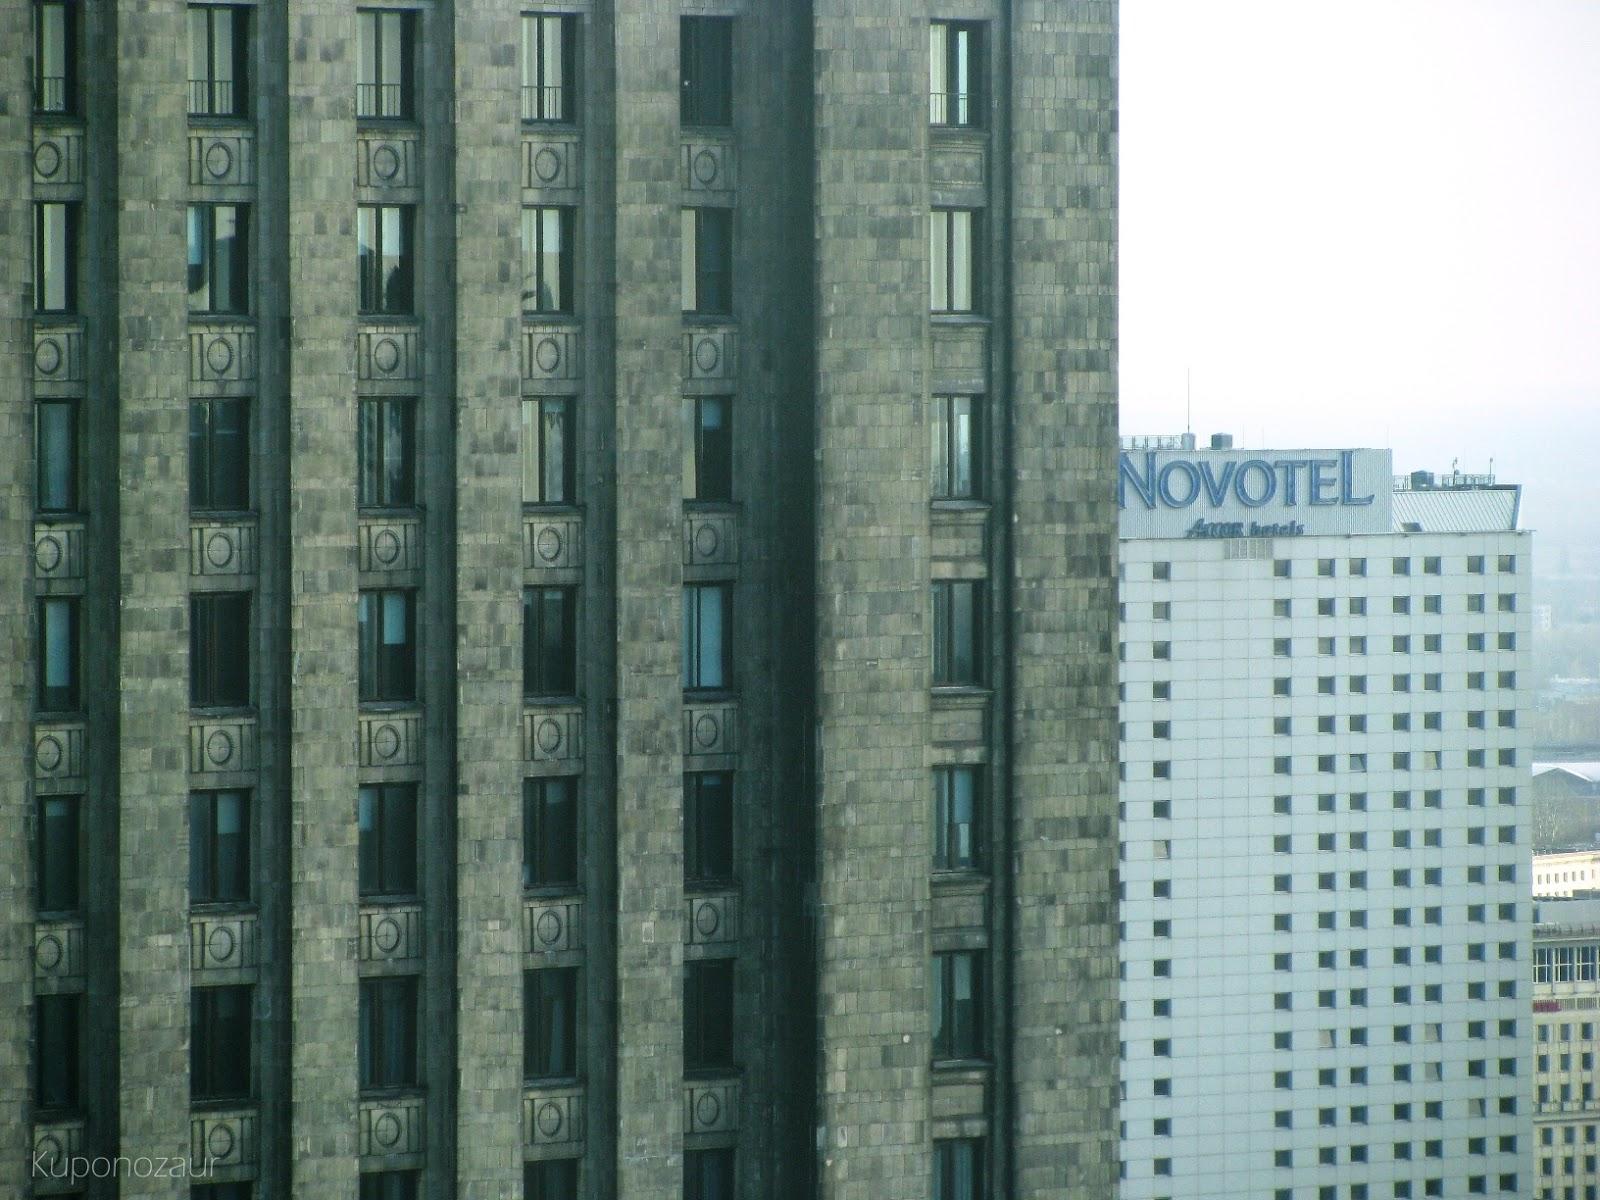 InterContinental Warszawa Novotel za Pałacem Kultury i Nauki